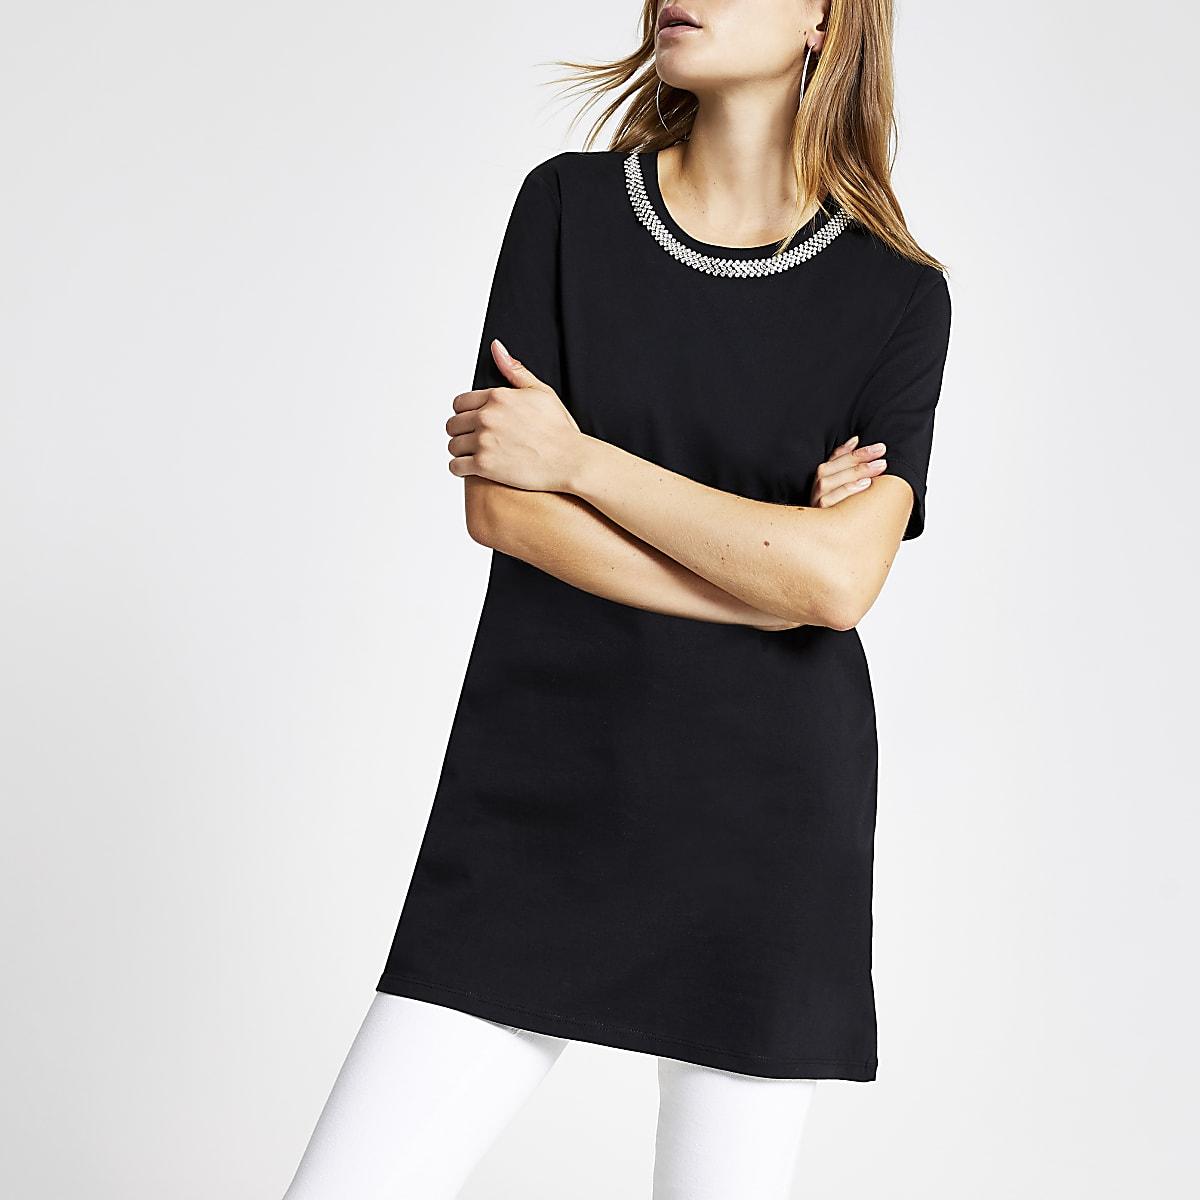 Schwarzes, langes T-Shirt